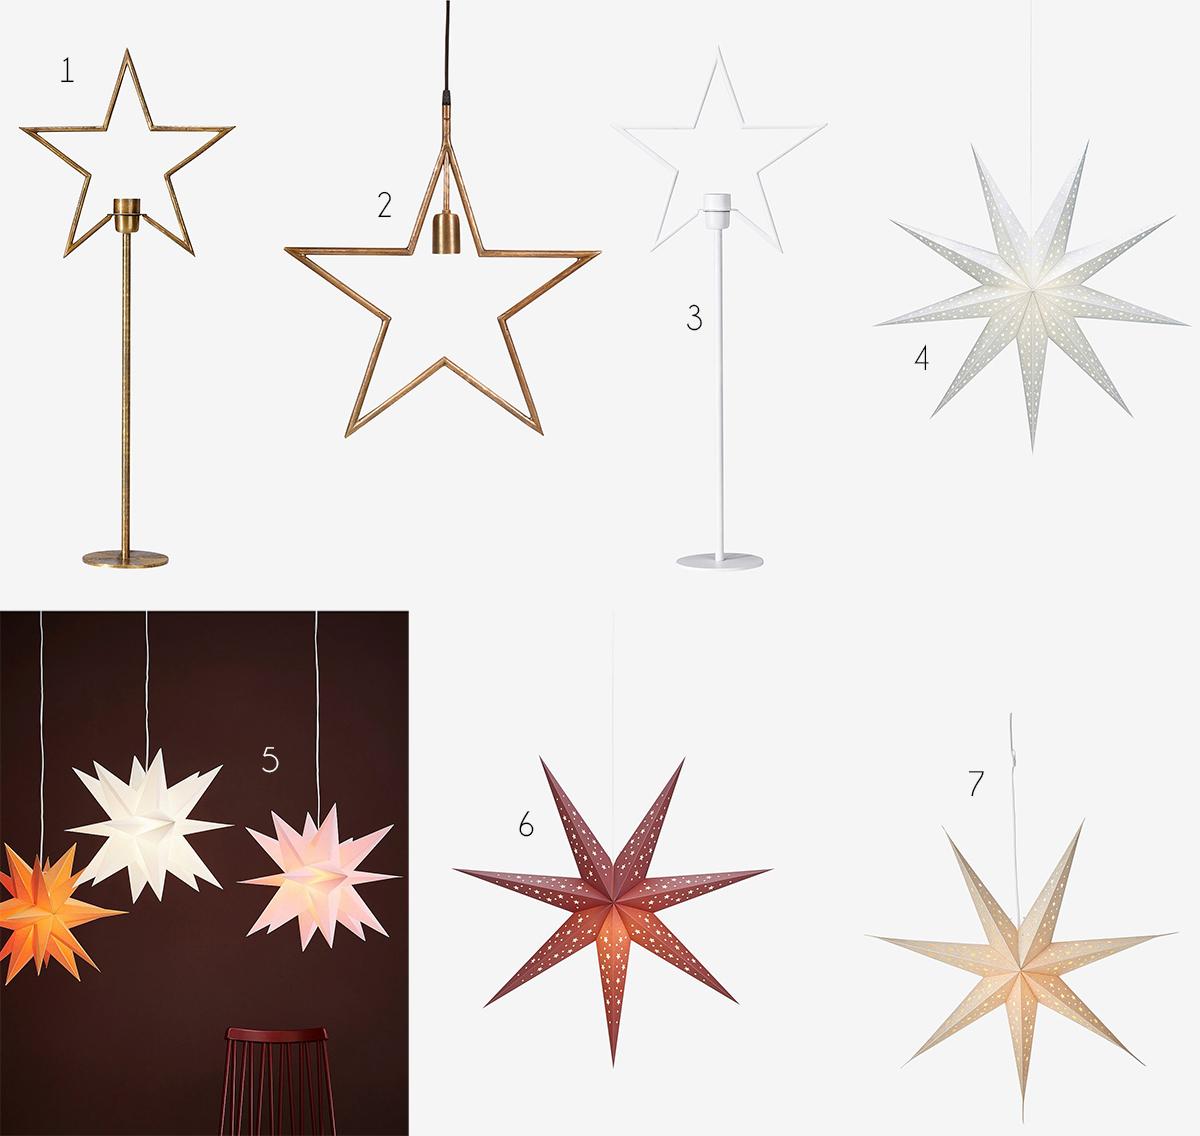 sju stjärnor